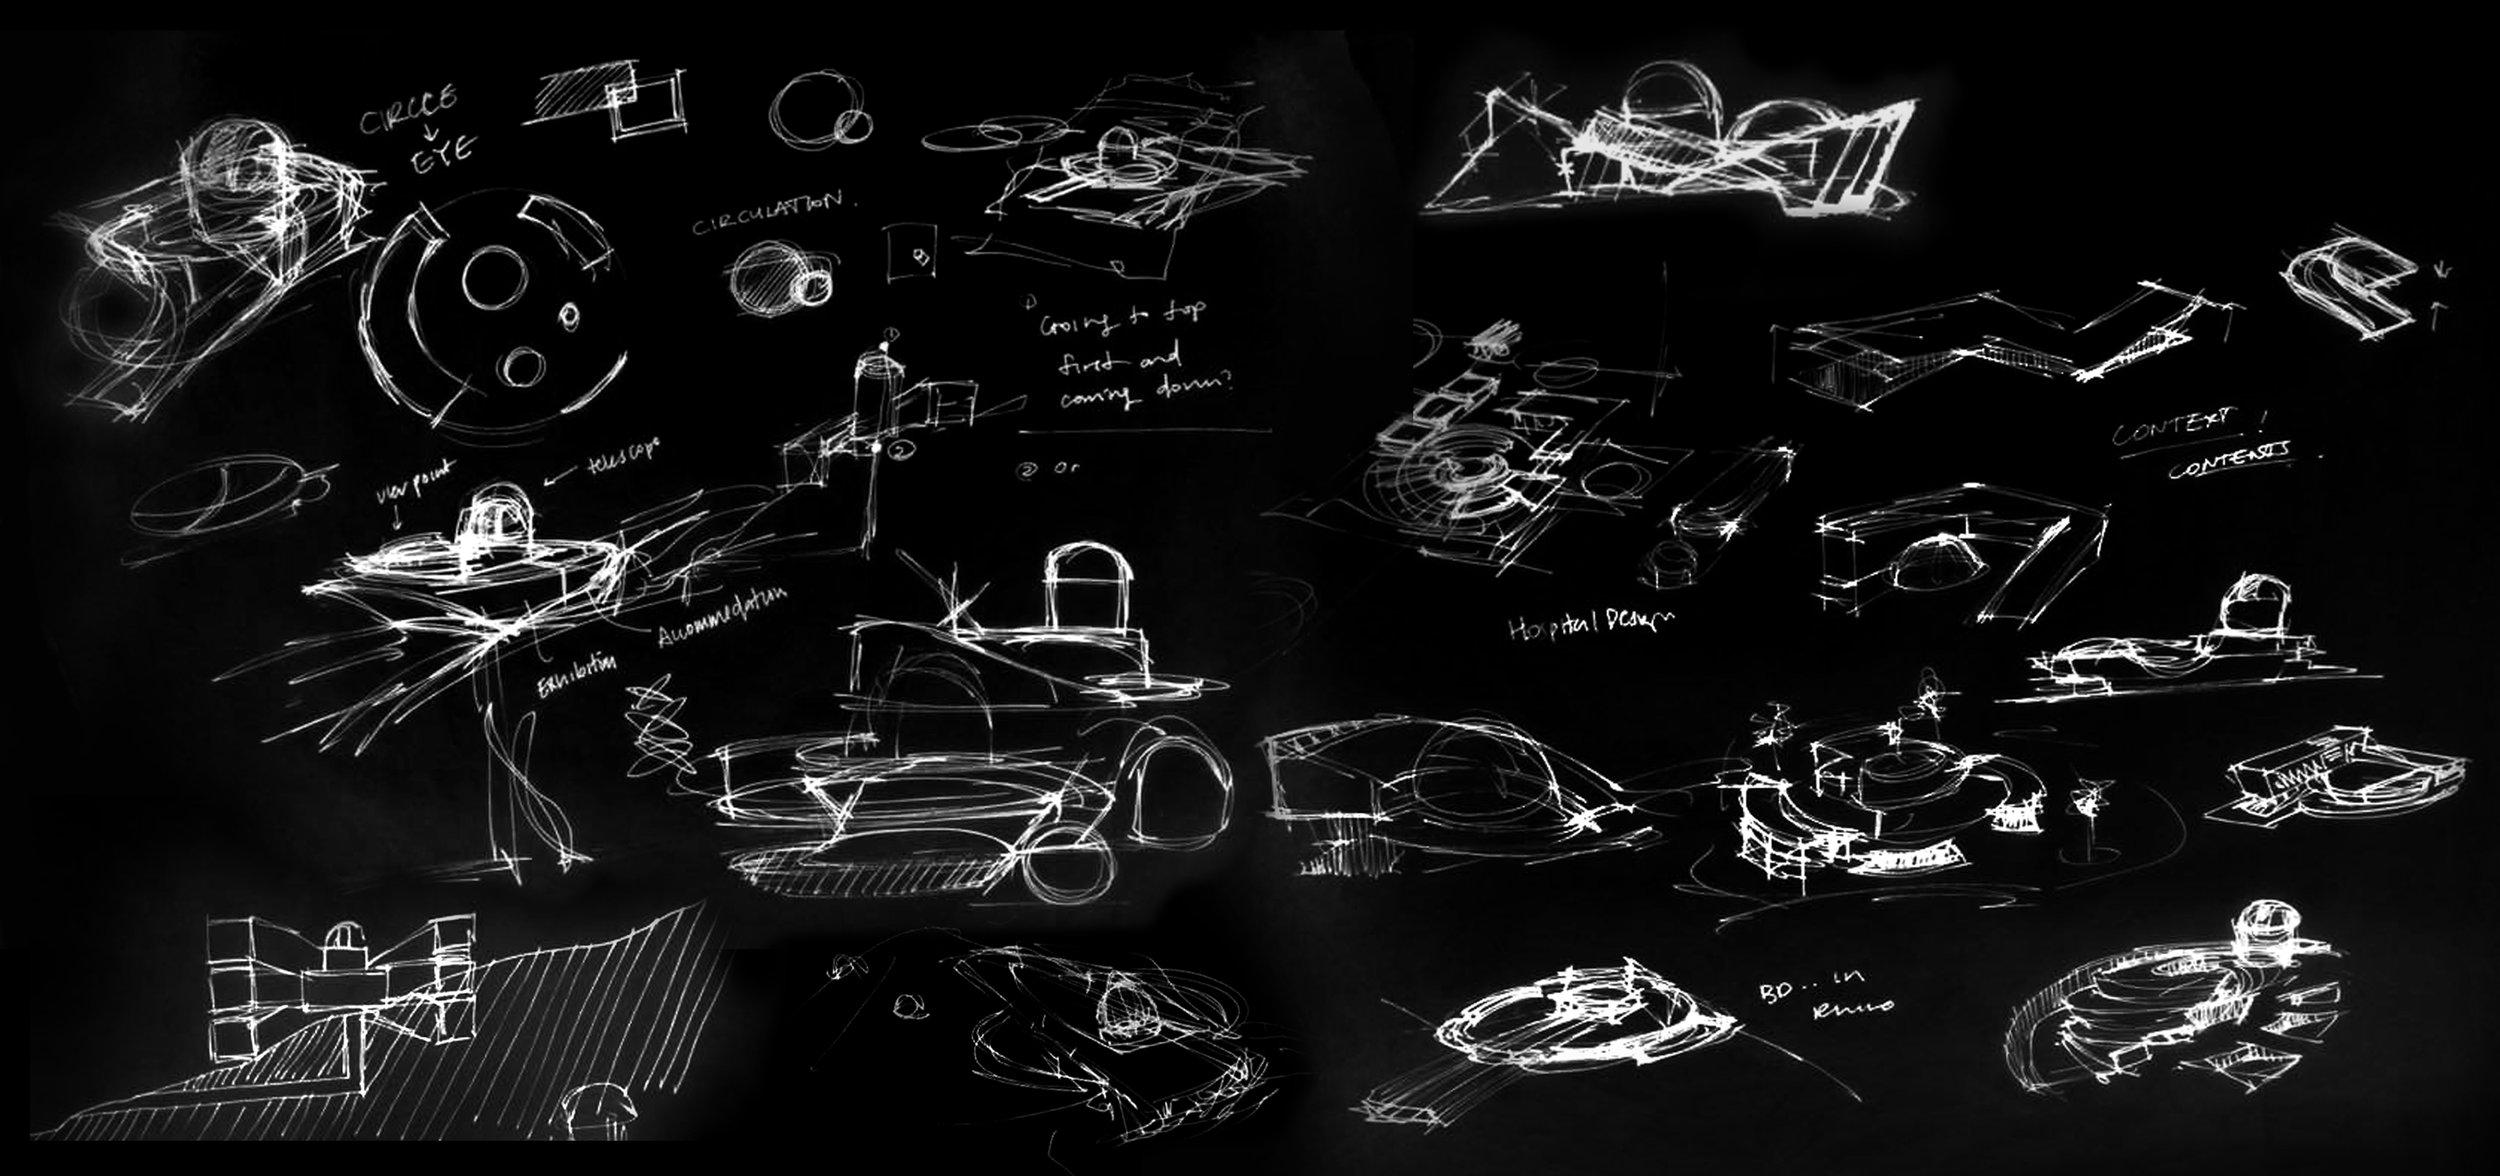 oblivion_design_process_sketches.jpg